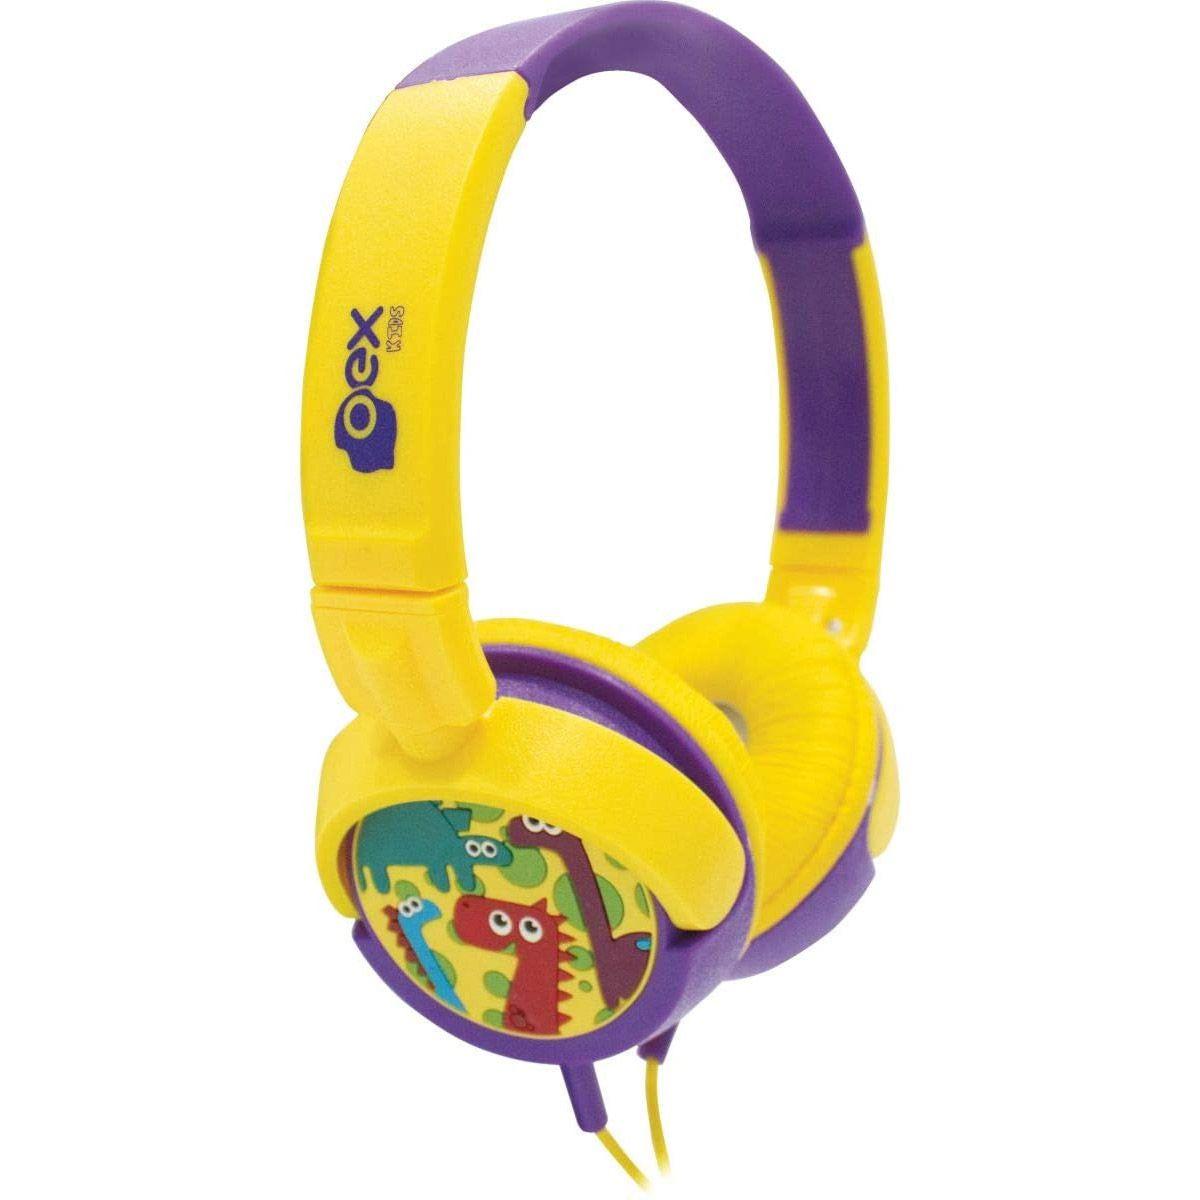 HeadPhone Infantil Oex Giratório KIDS Dino Amarelo/Roxo - HP300